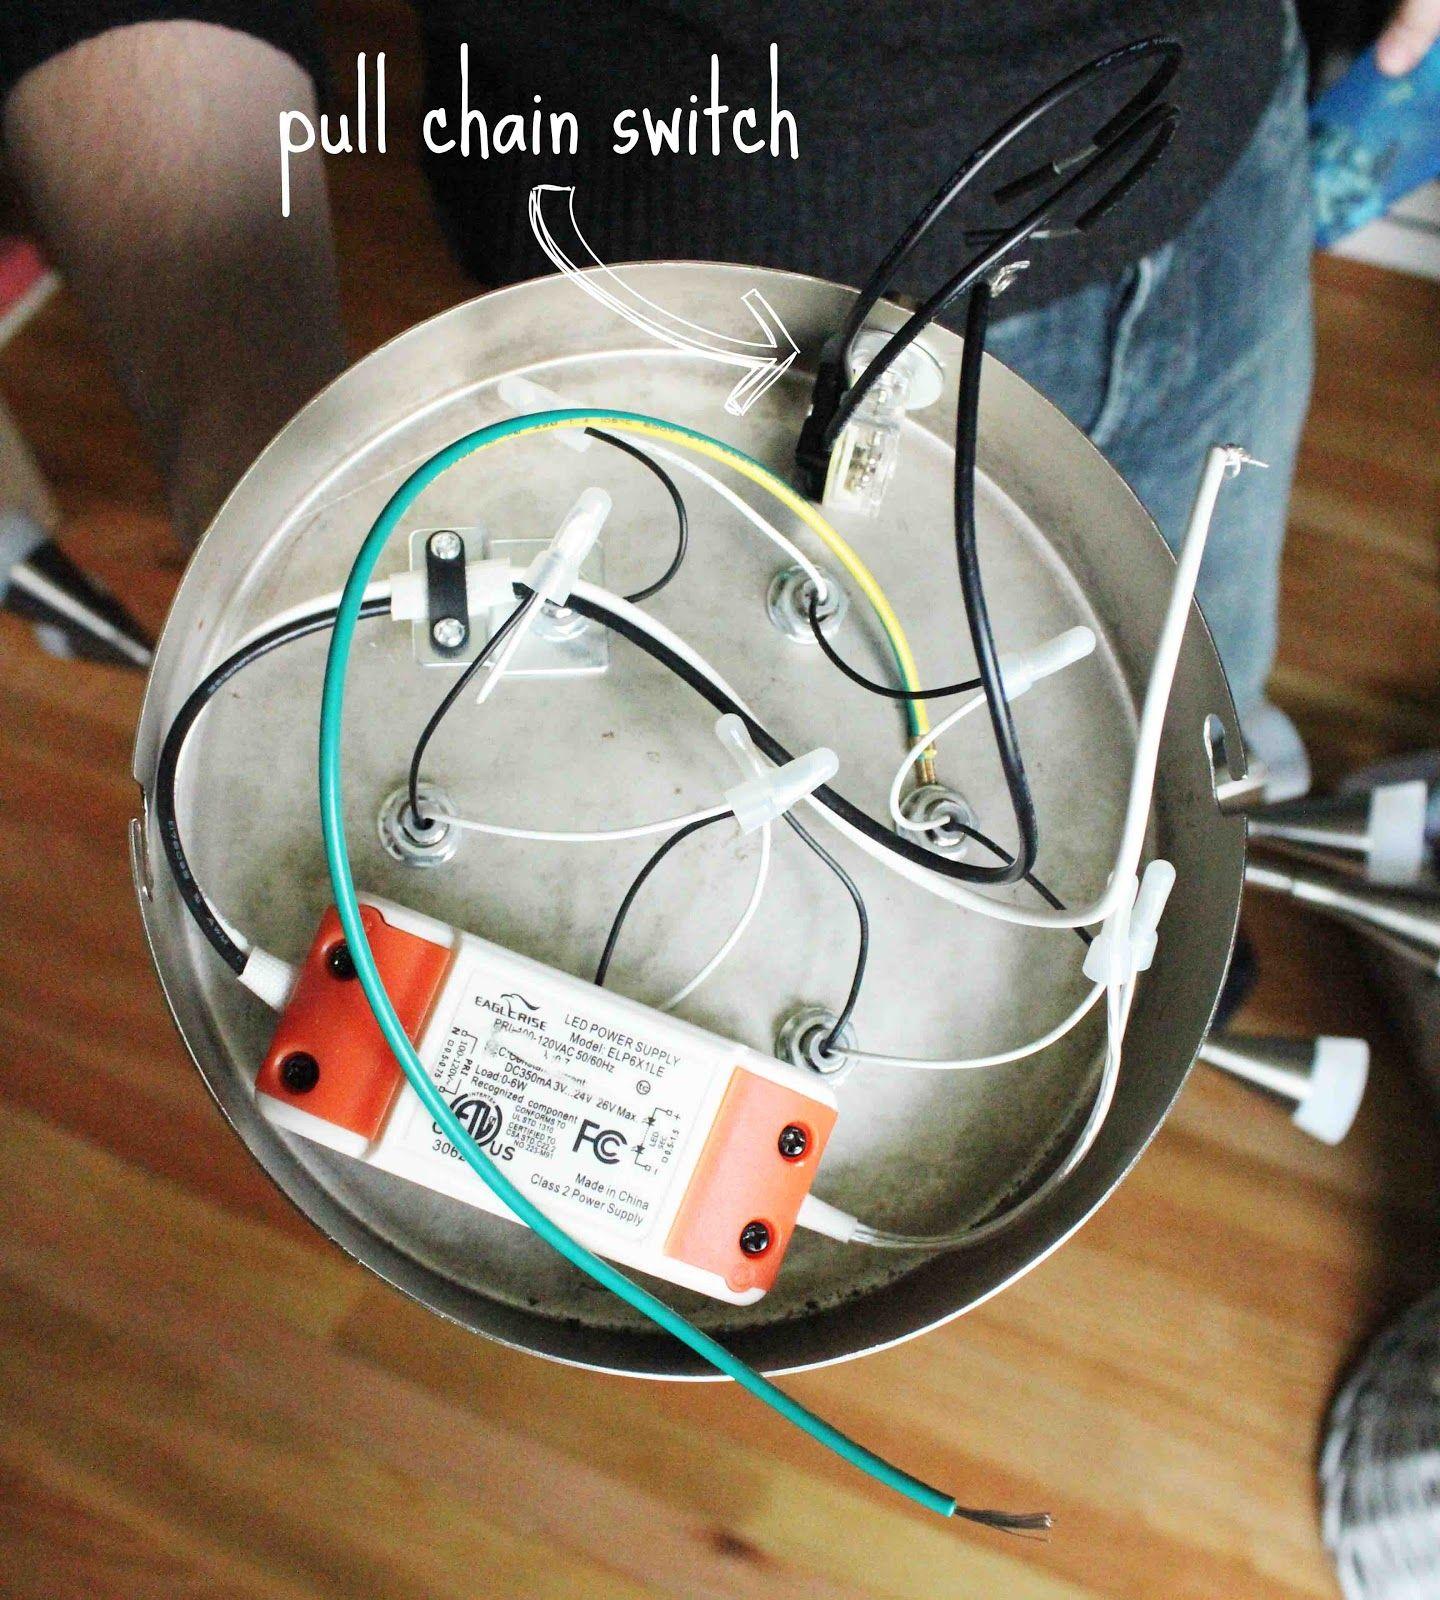 Crabfish convert any light to a pull chain fixture renovation crabfish convert any light to a pull chain fixture arubaitofo Gallery